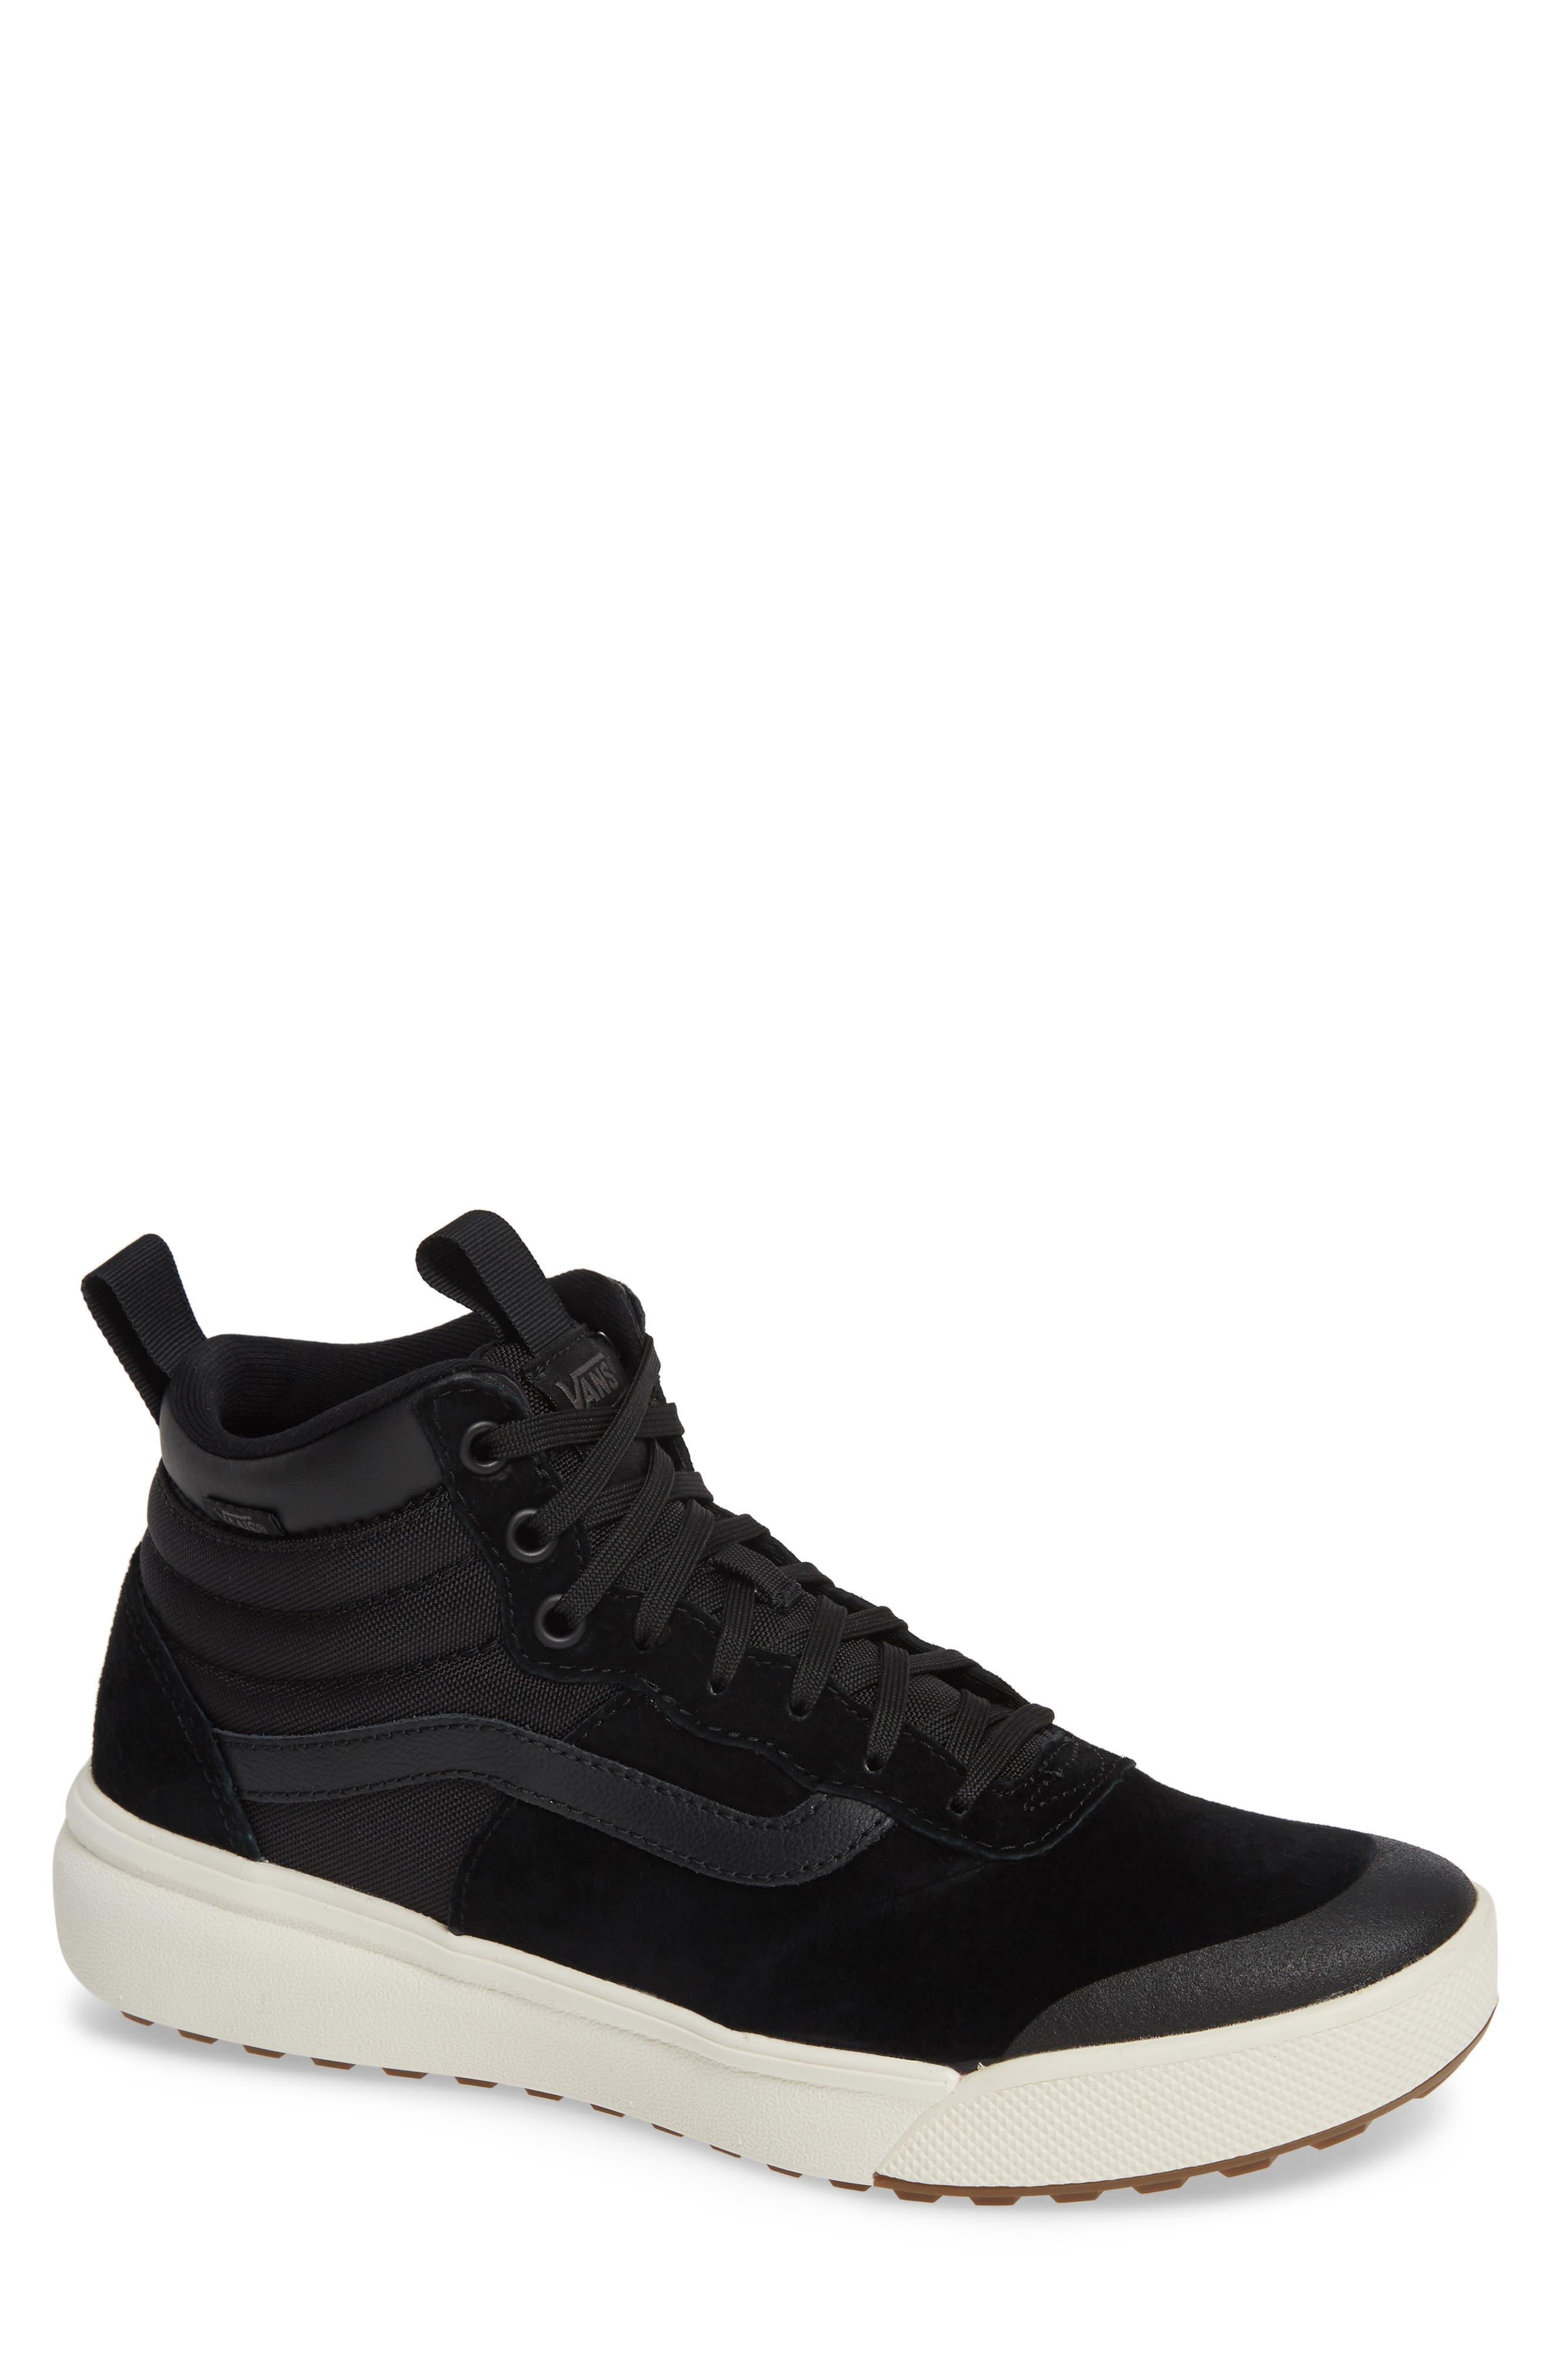 Ultrarange Hi Sneaker,                             Main thumbnail 1, color,                             BLACK